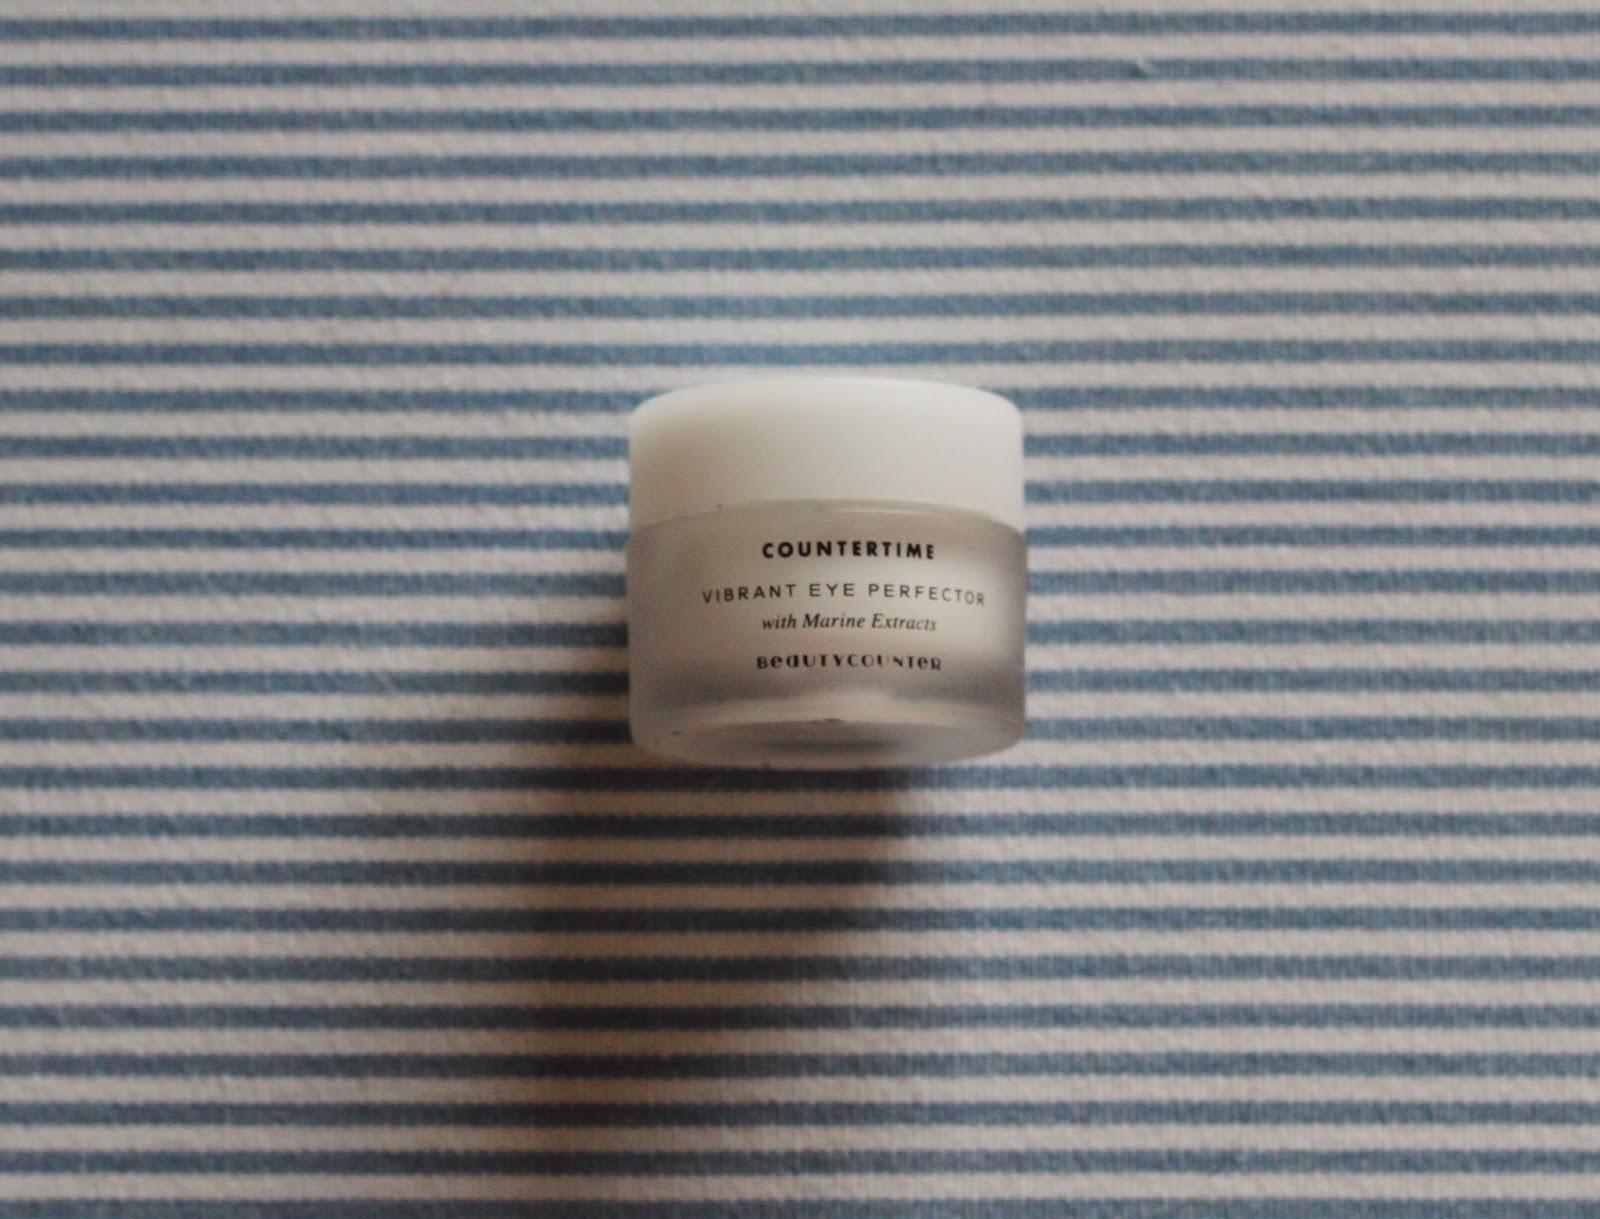 beauty counter eye cream